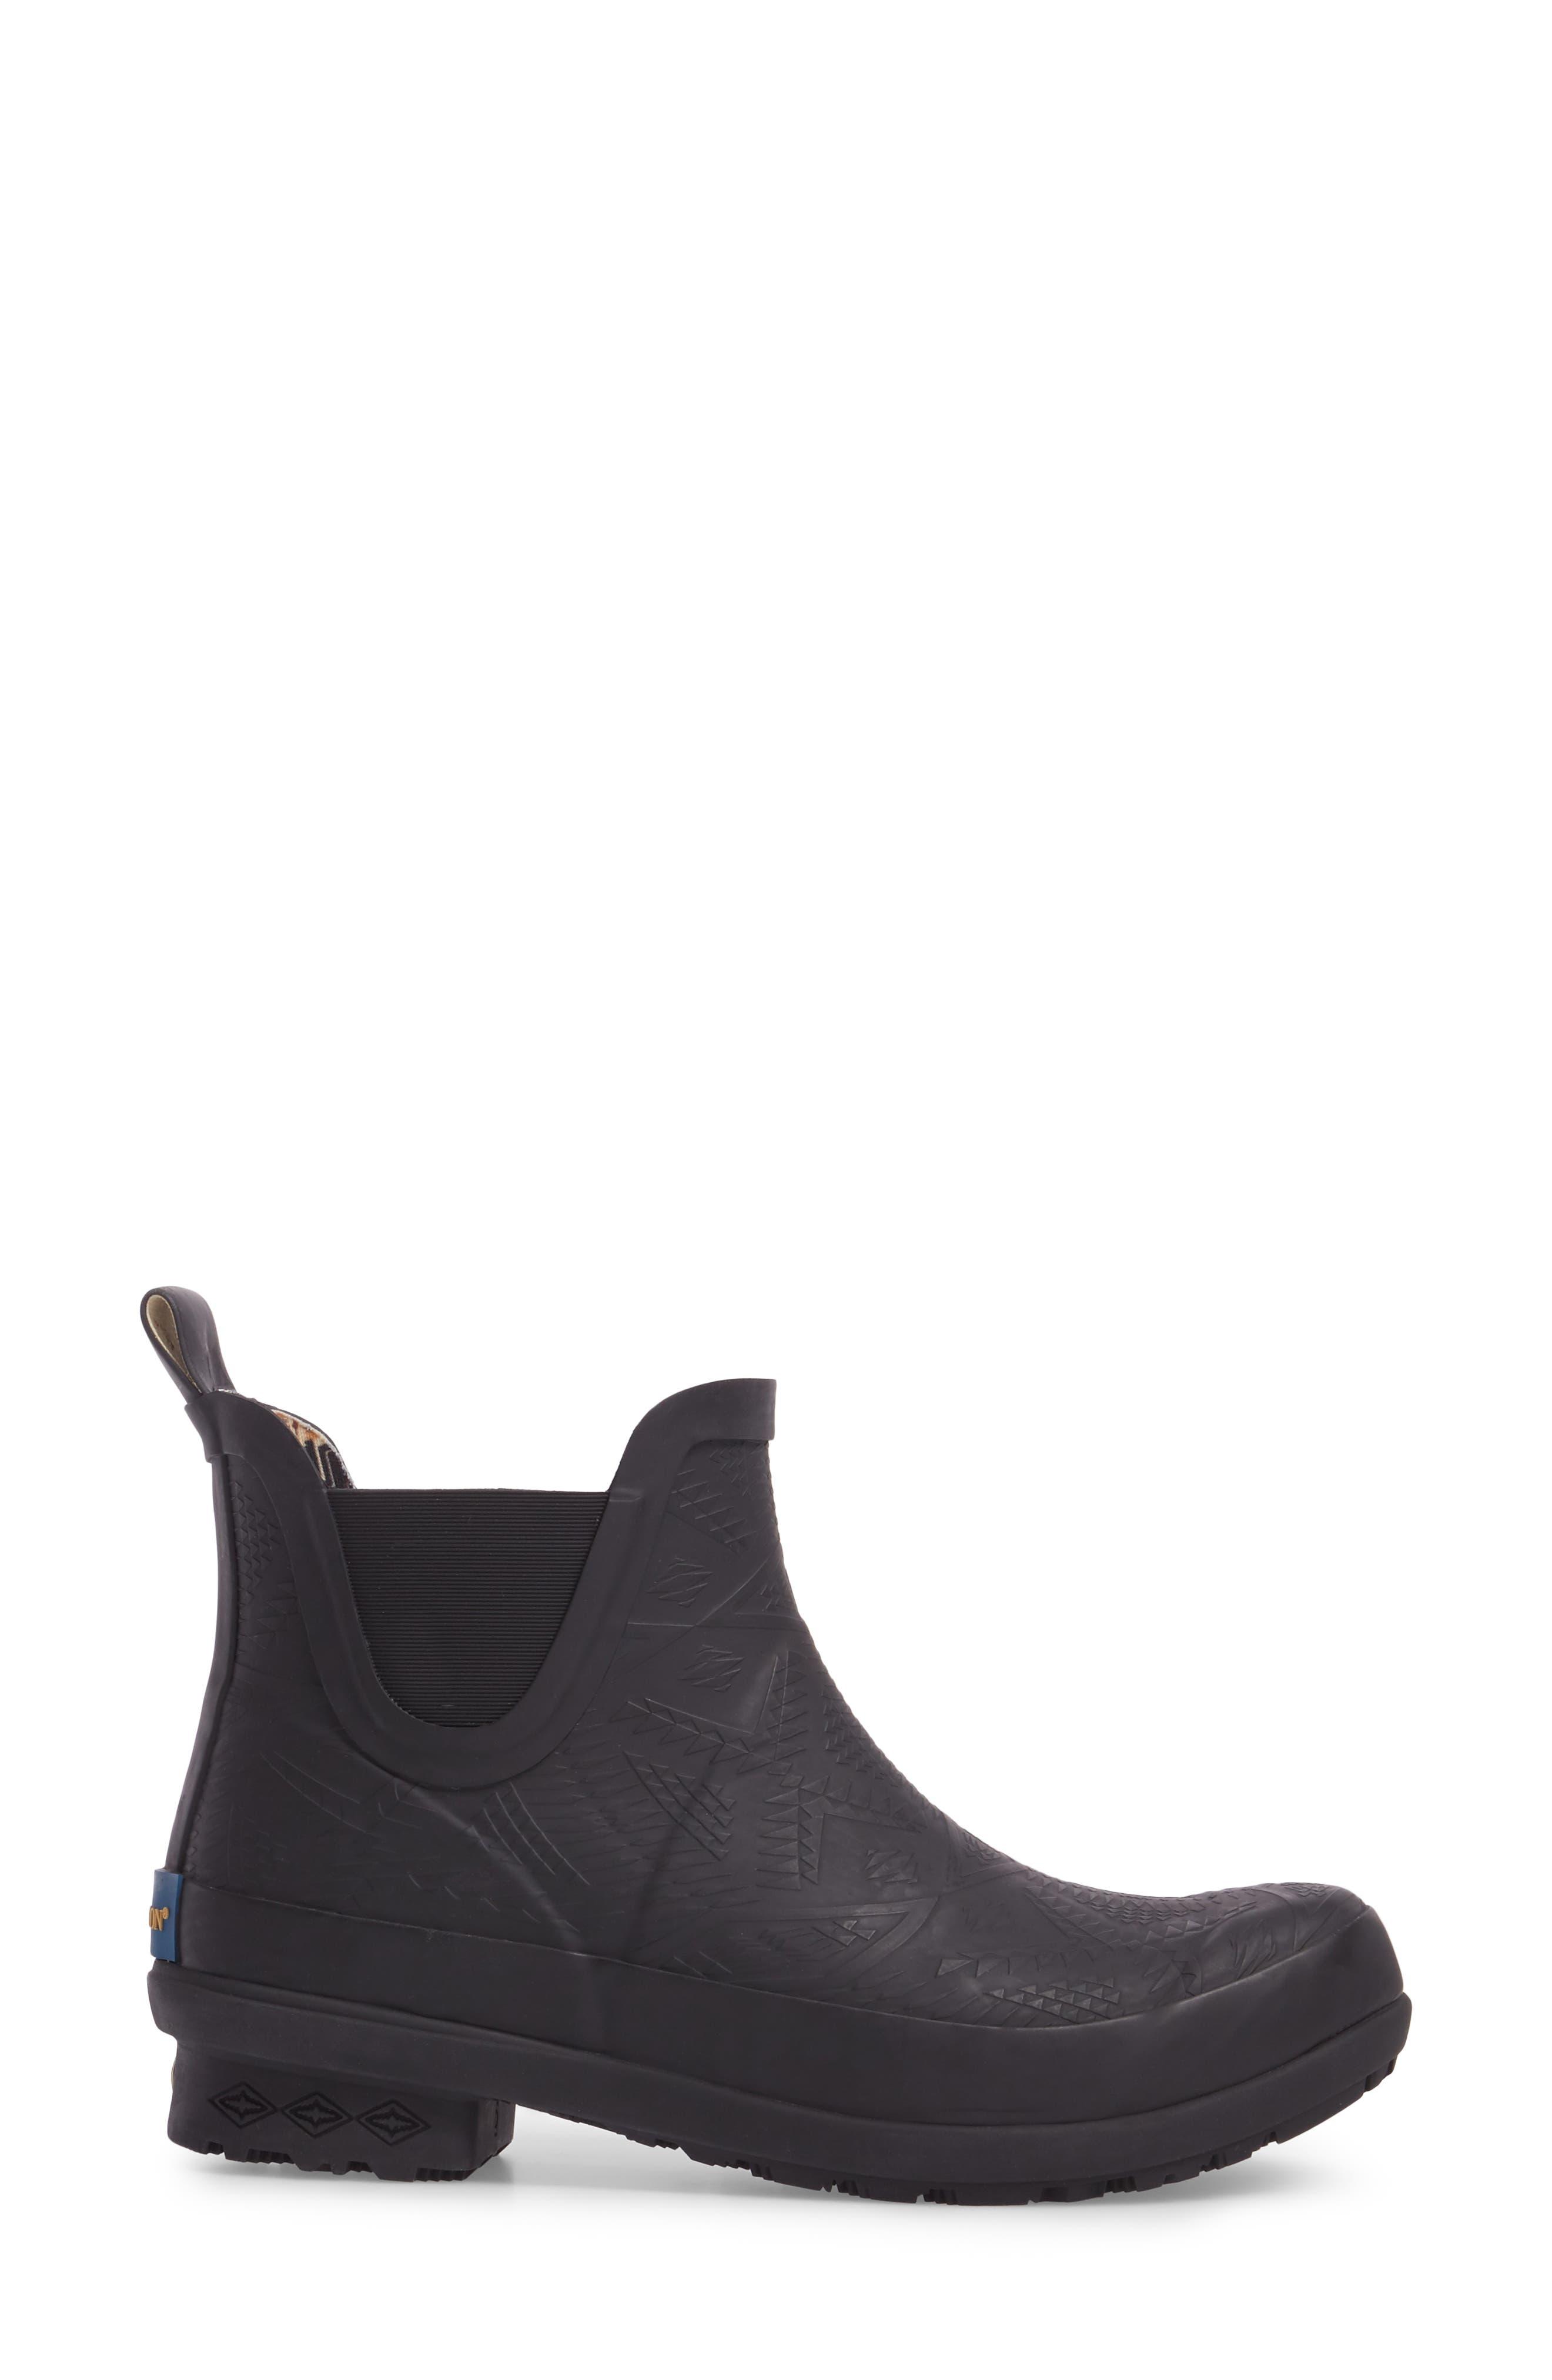 Pendleton Embossed Chelsea Rain Boot,                             Alternate thumbnail 3, color,                             BLACK